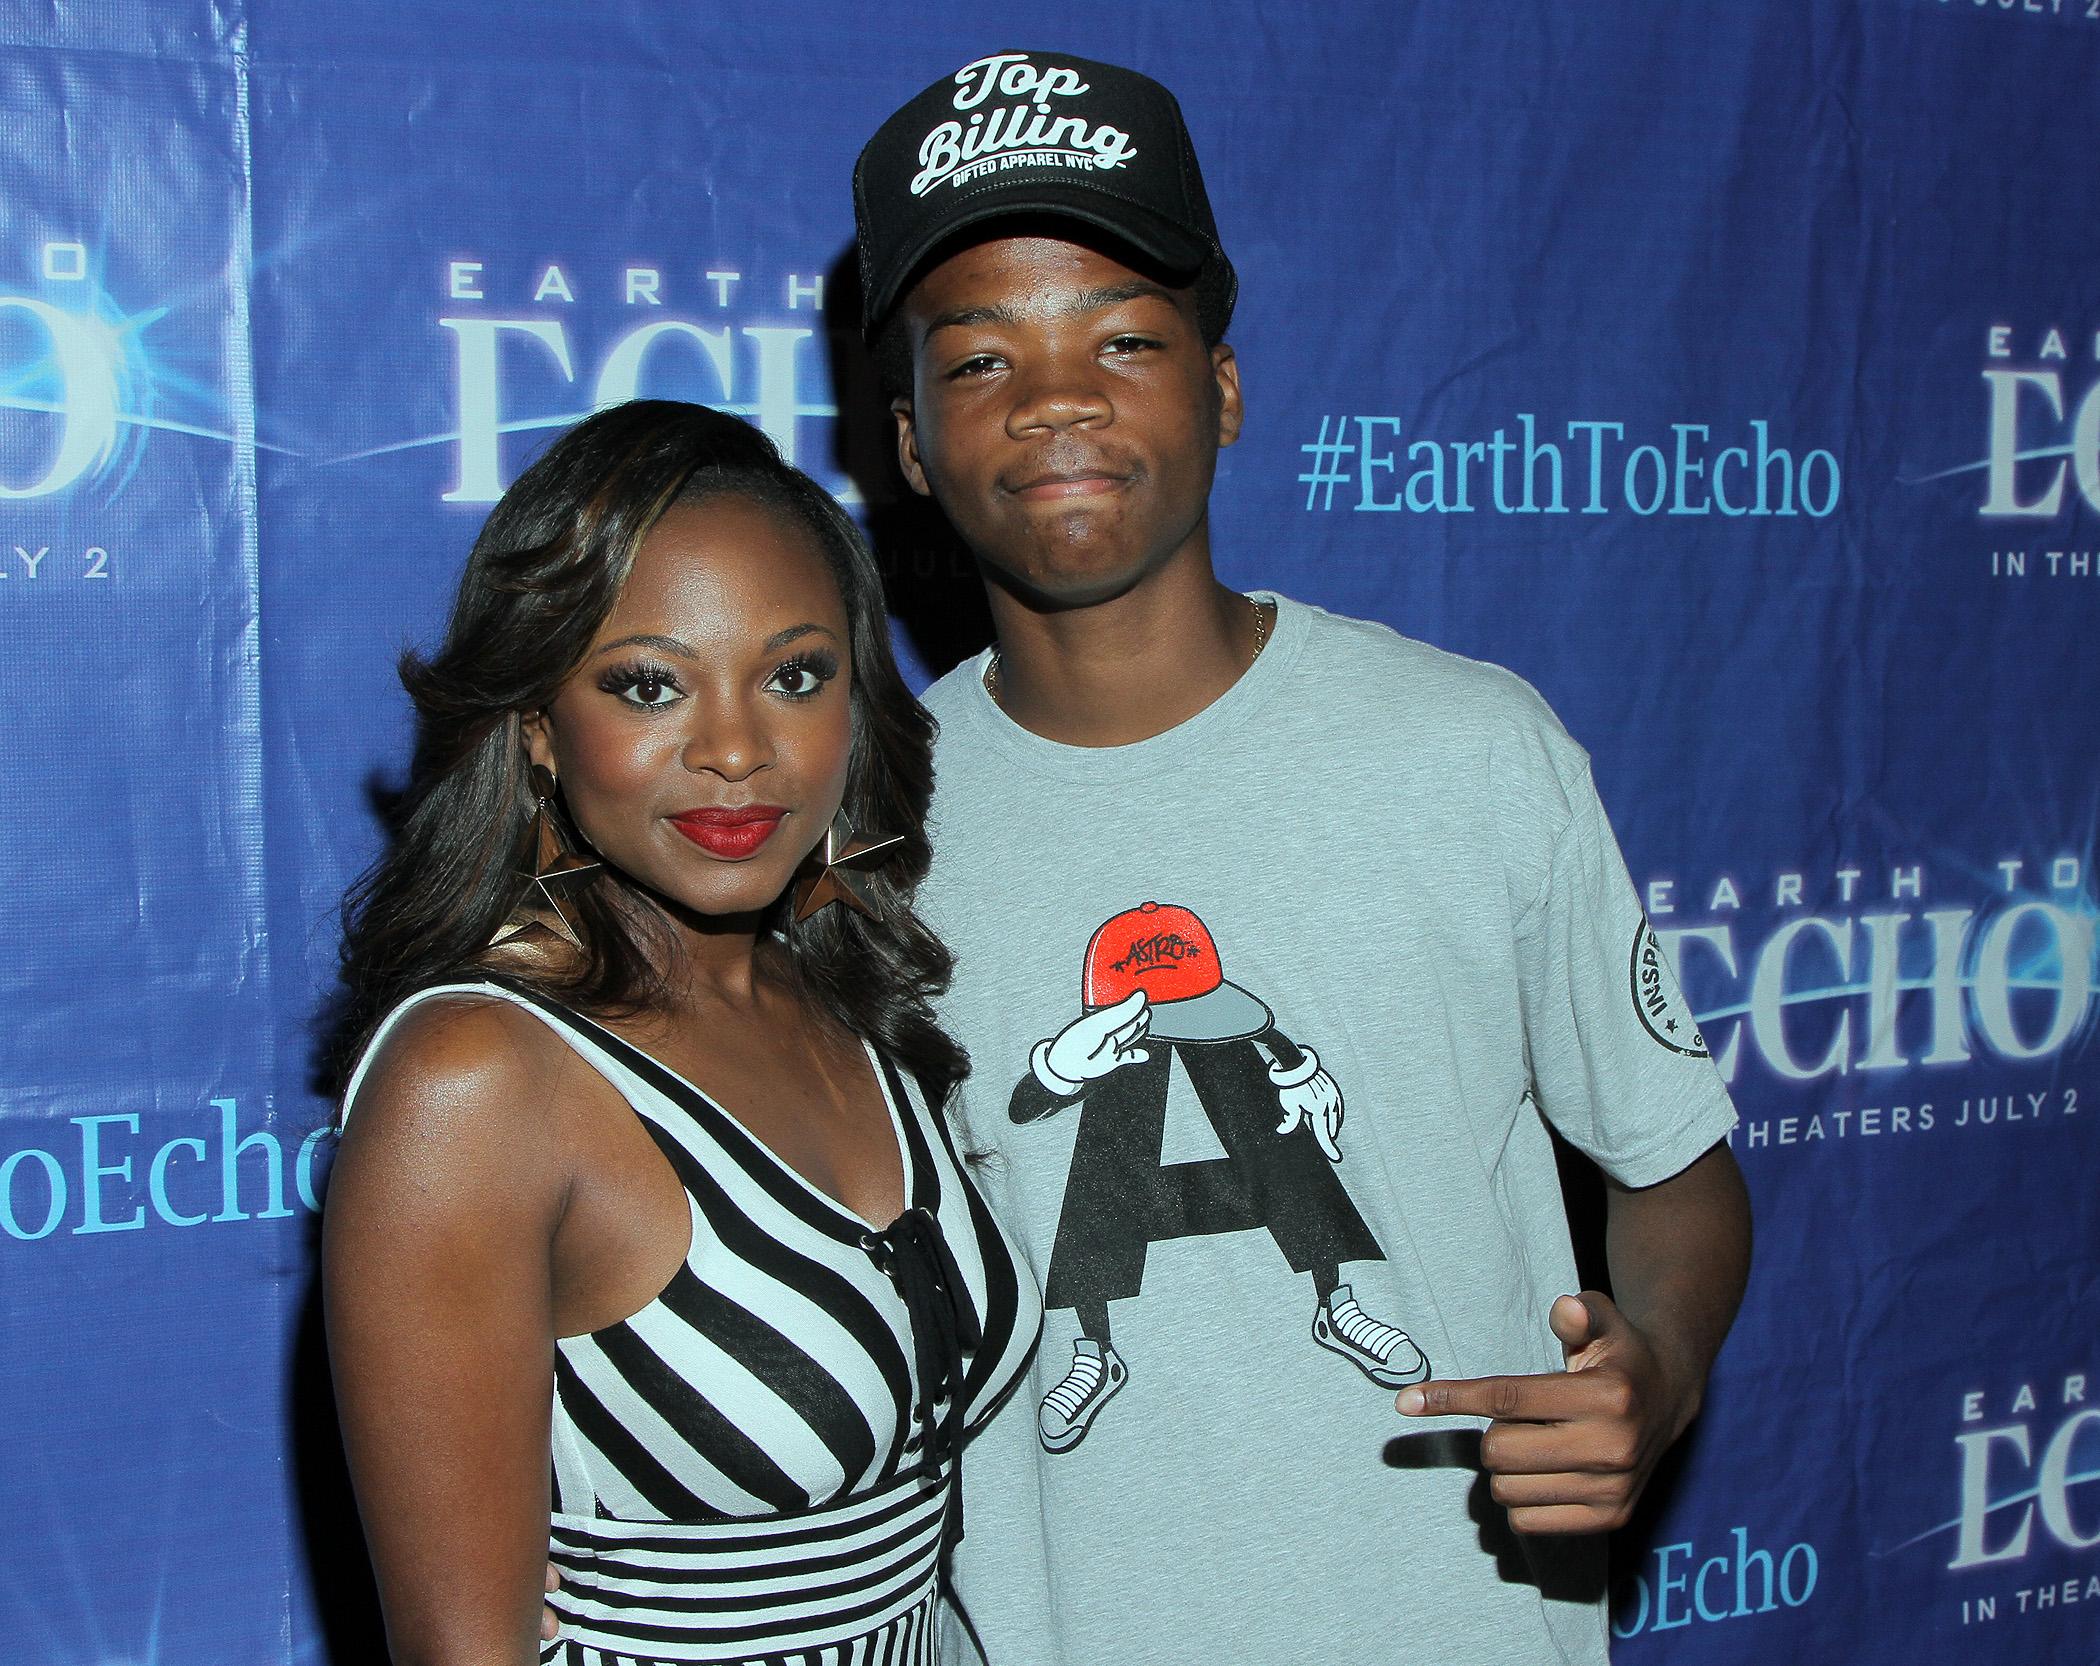 Naturi Naughton and EARTH TO ECHO star Astro